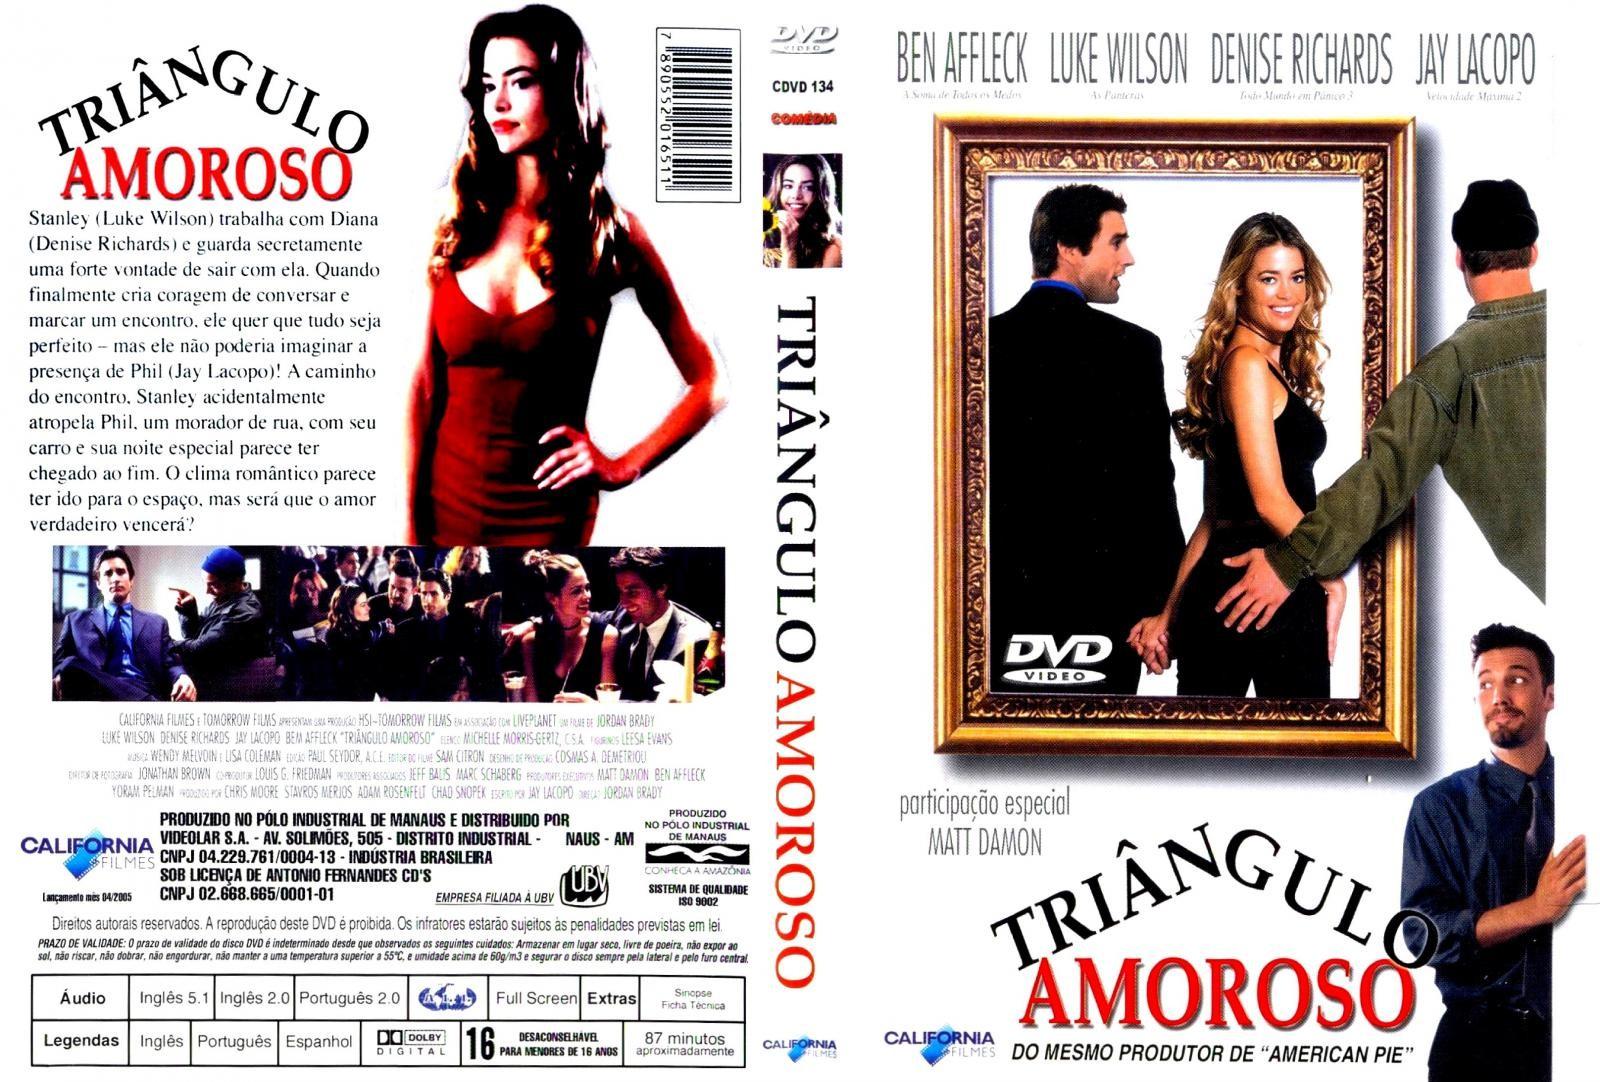 http://4.bp.blogspot.com/_ET4mSvvgIvQ/TERWH8RKyCI/AAAAAAAAAyM/9zdcLydG0OY/s1600/Triangulo-Amoroso-BR.jpg